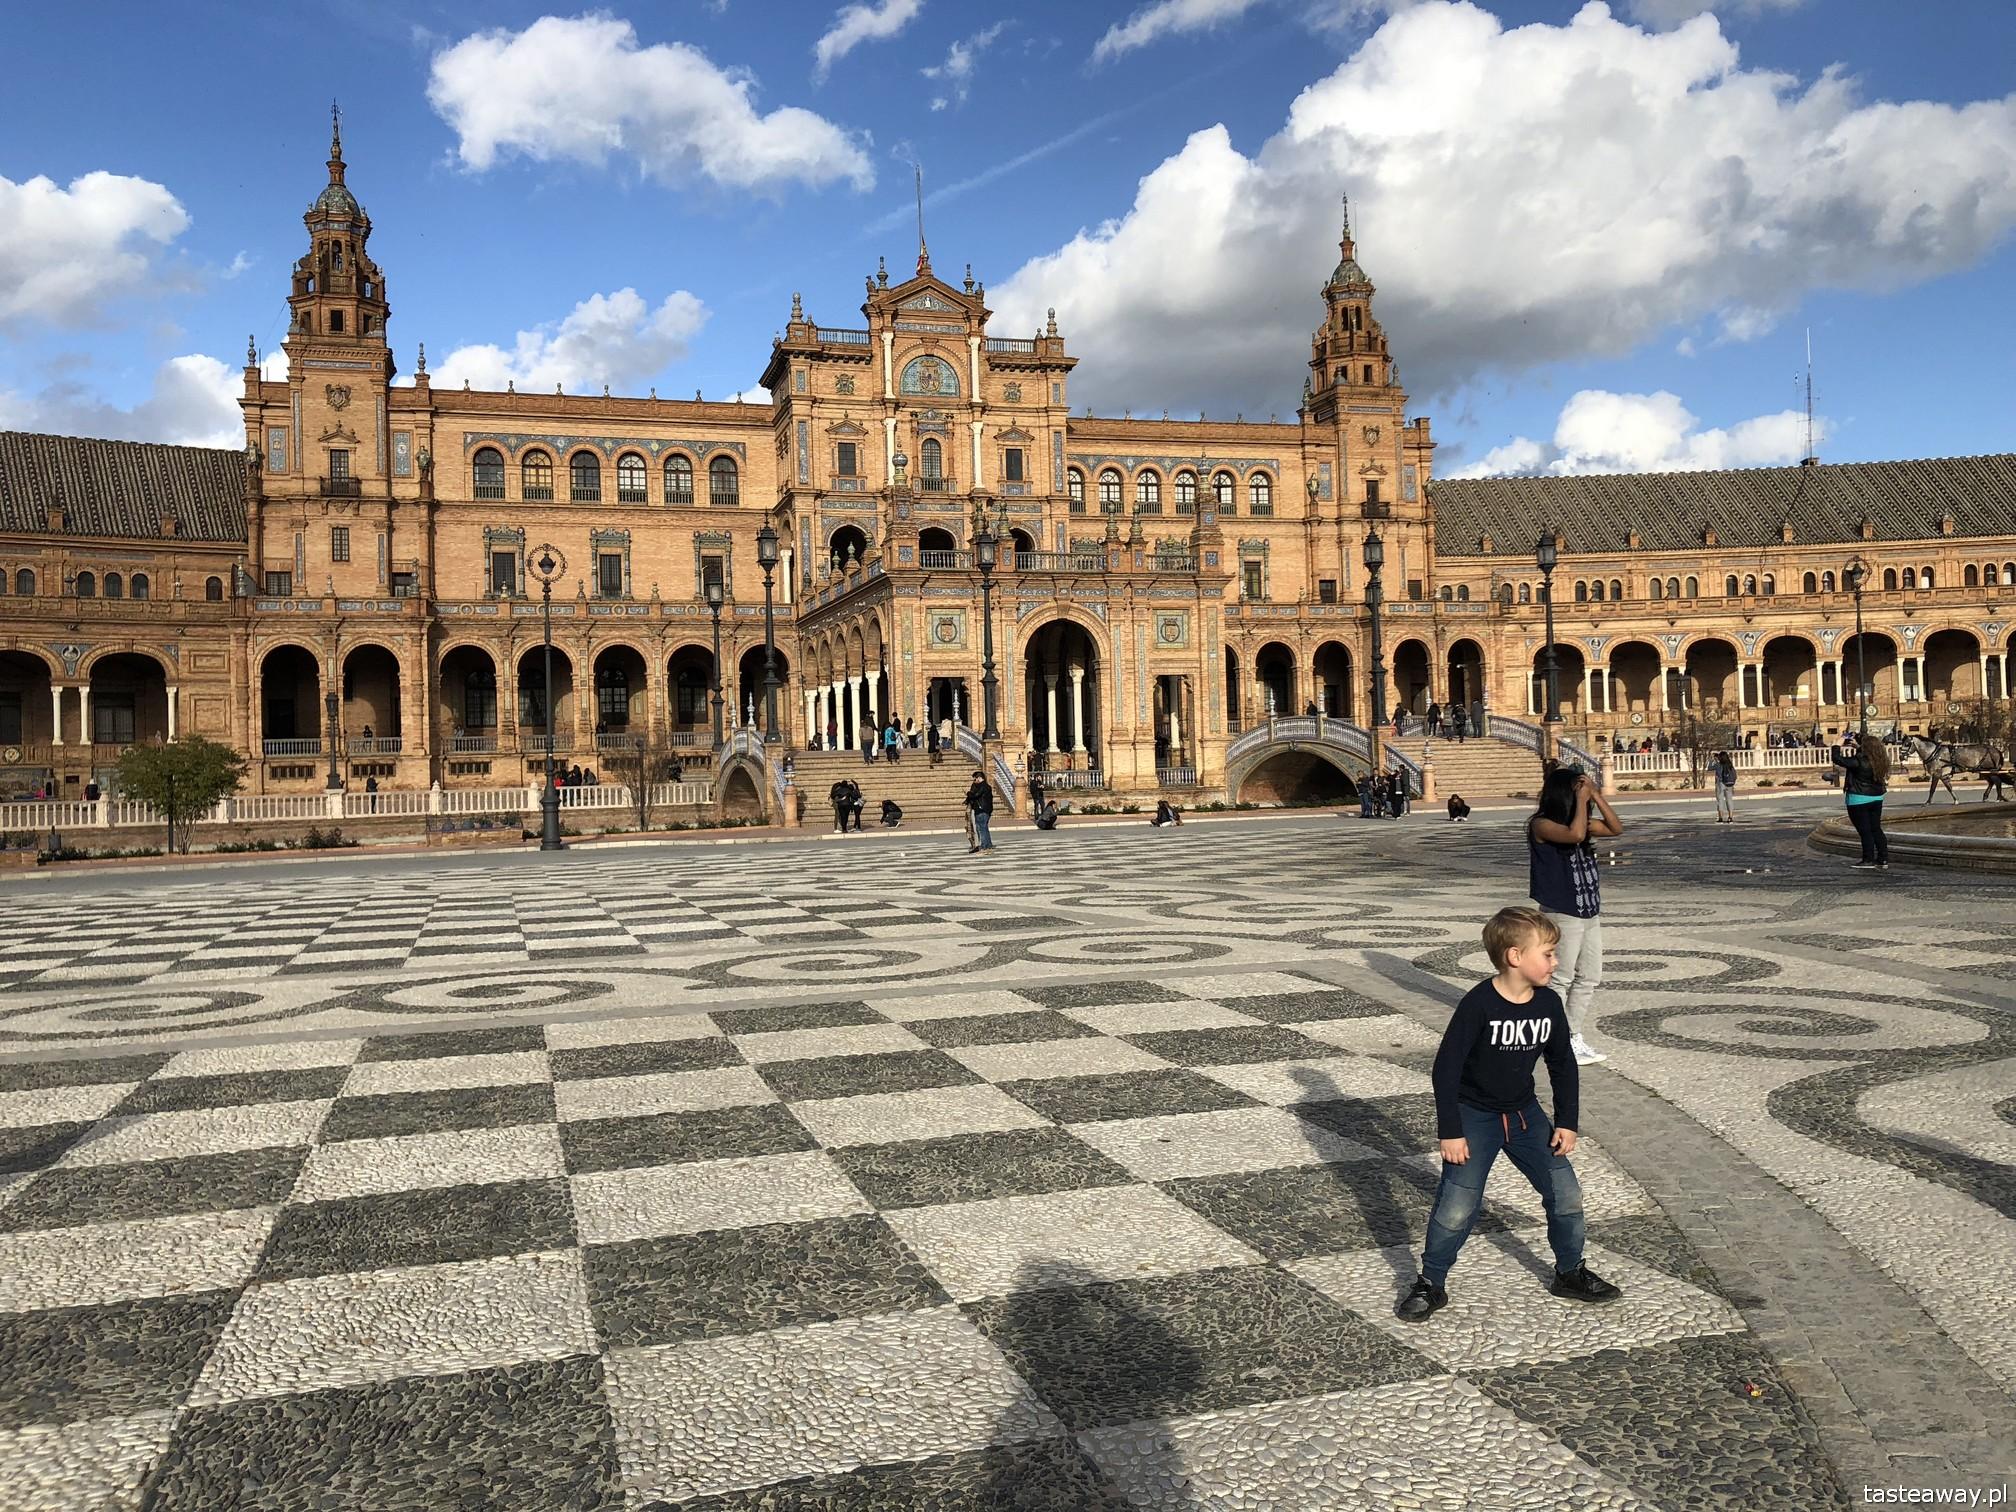 Sewilla, Sevilla, co zobaczyć w Sewilli, Sevilla w jeden dzień, Andaluzja, miasta Hiszpanii, spacer po Sevilli, Plac Hiszpański, Plaza de Espana